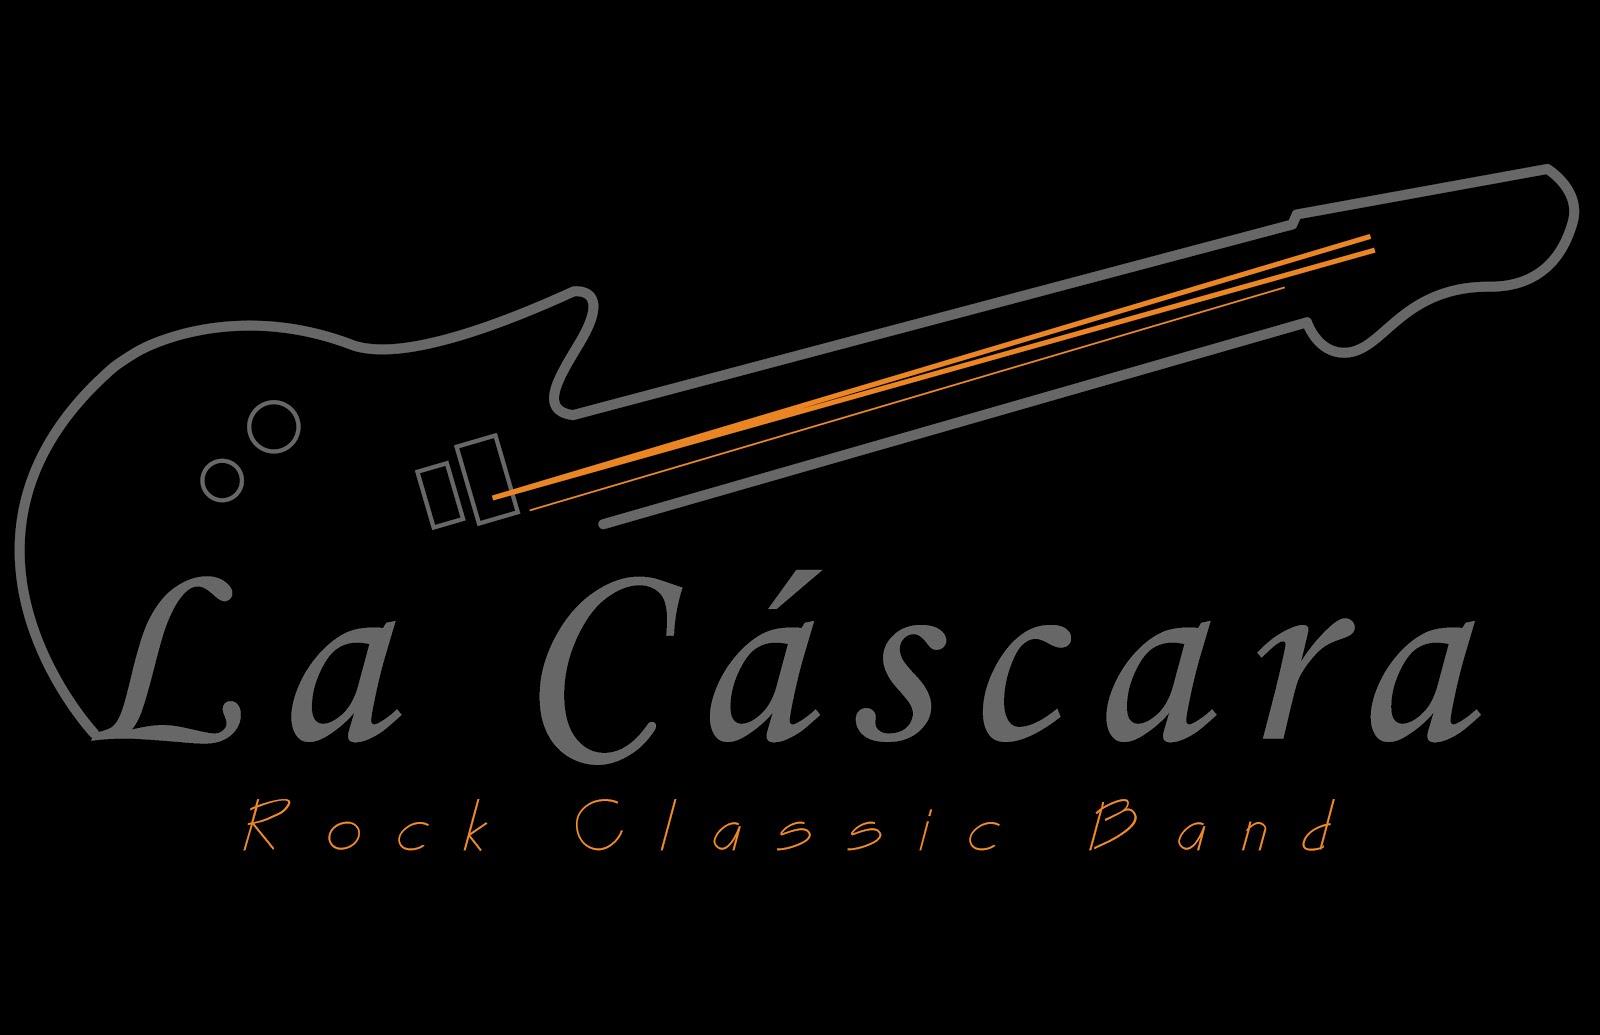 LA CÁSCARA ROCK CLASSIC BAND